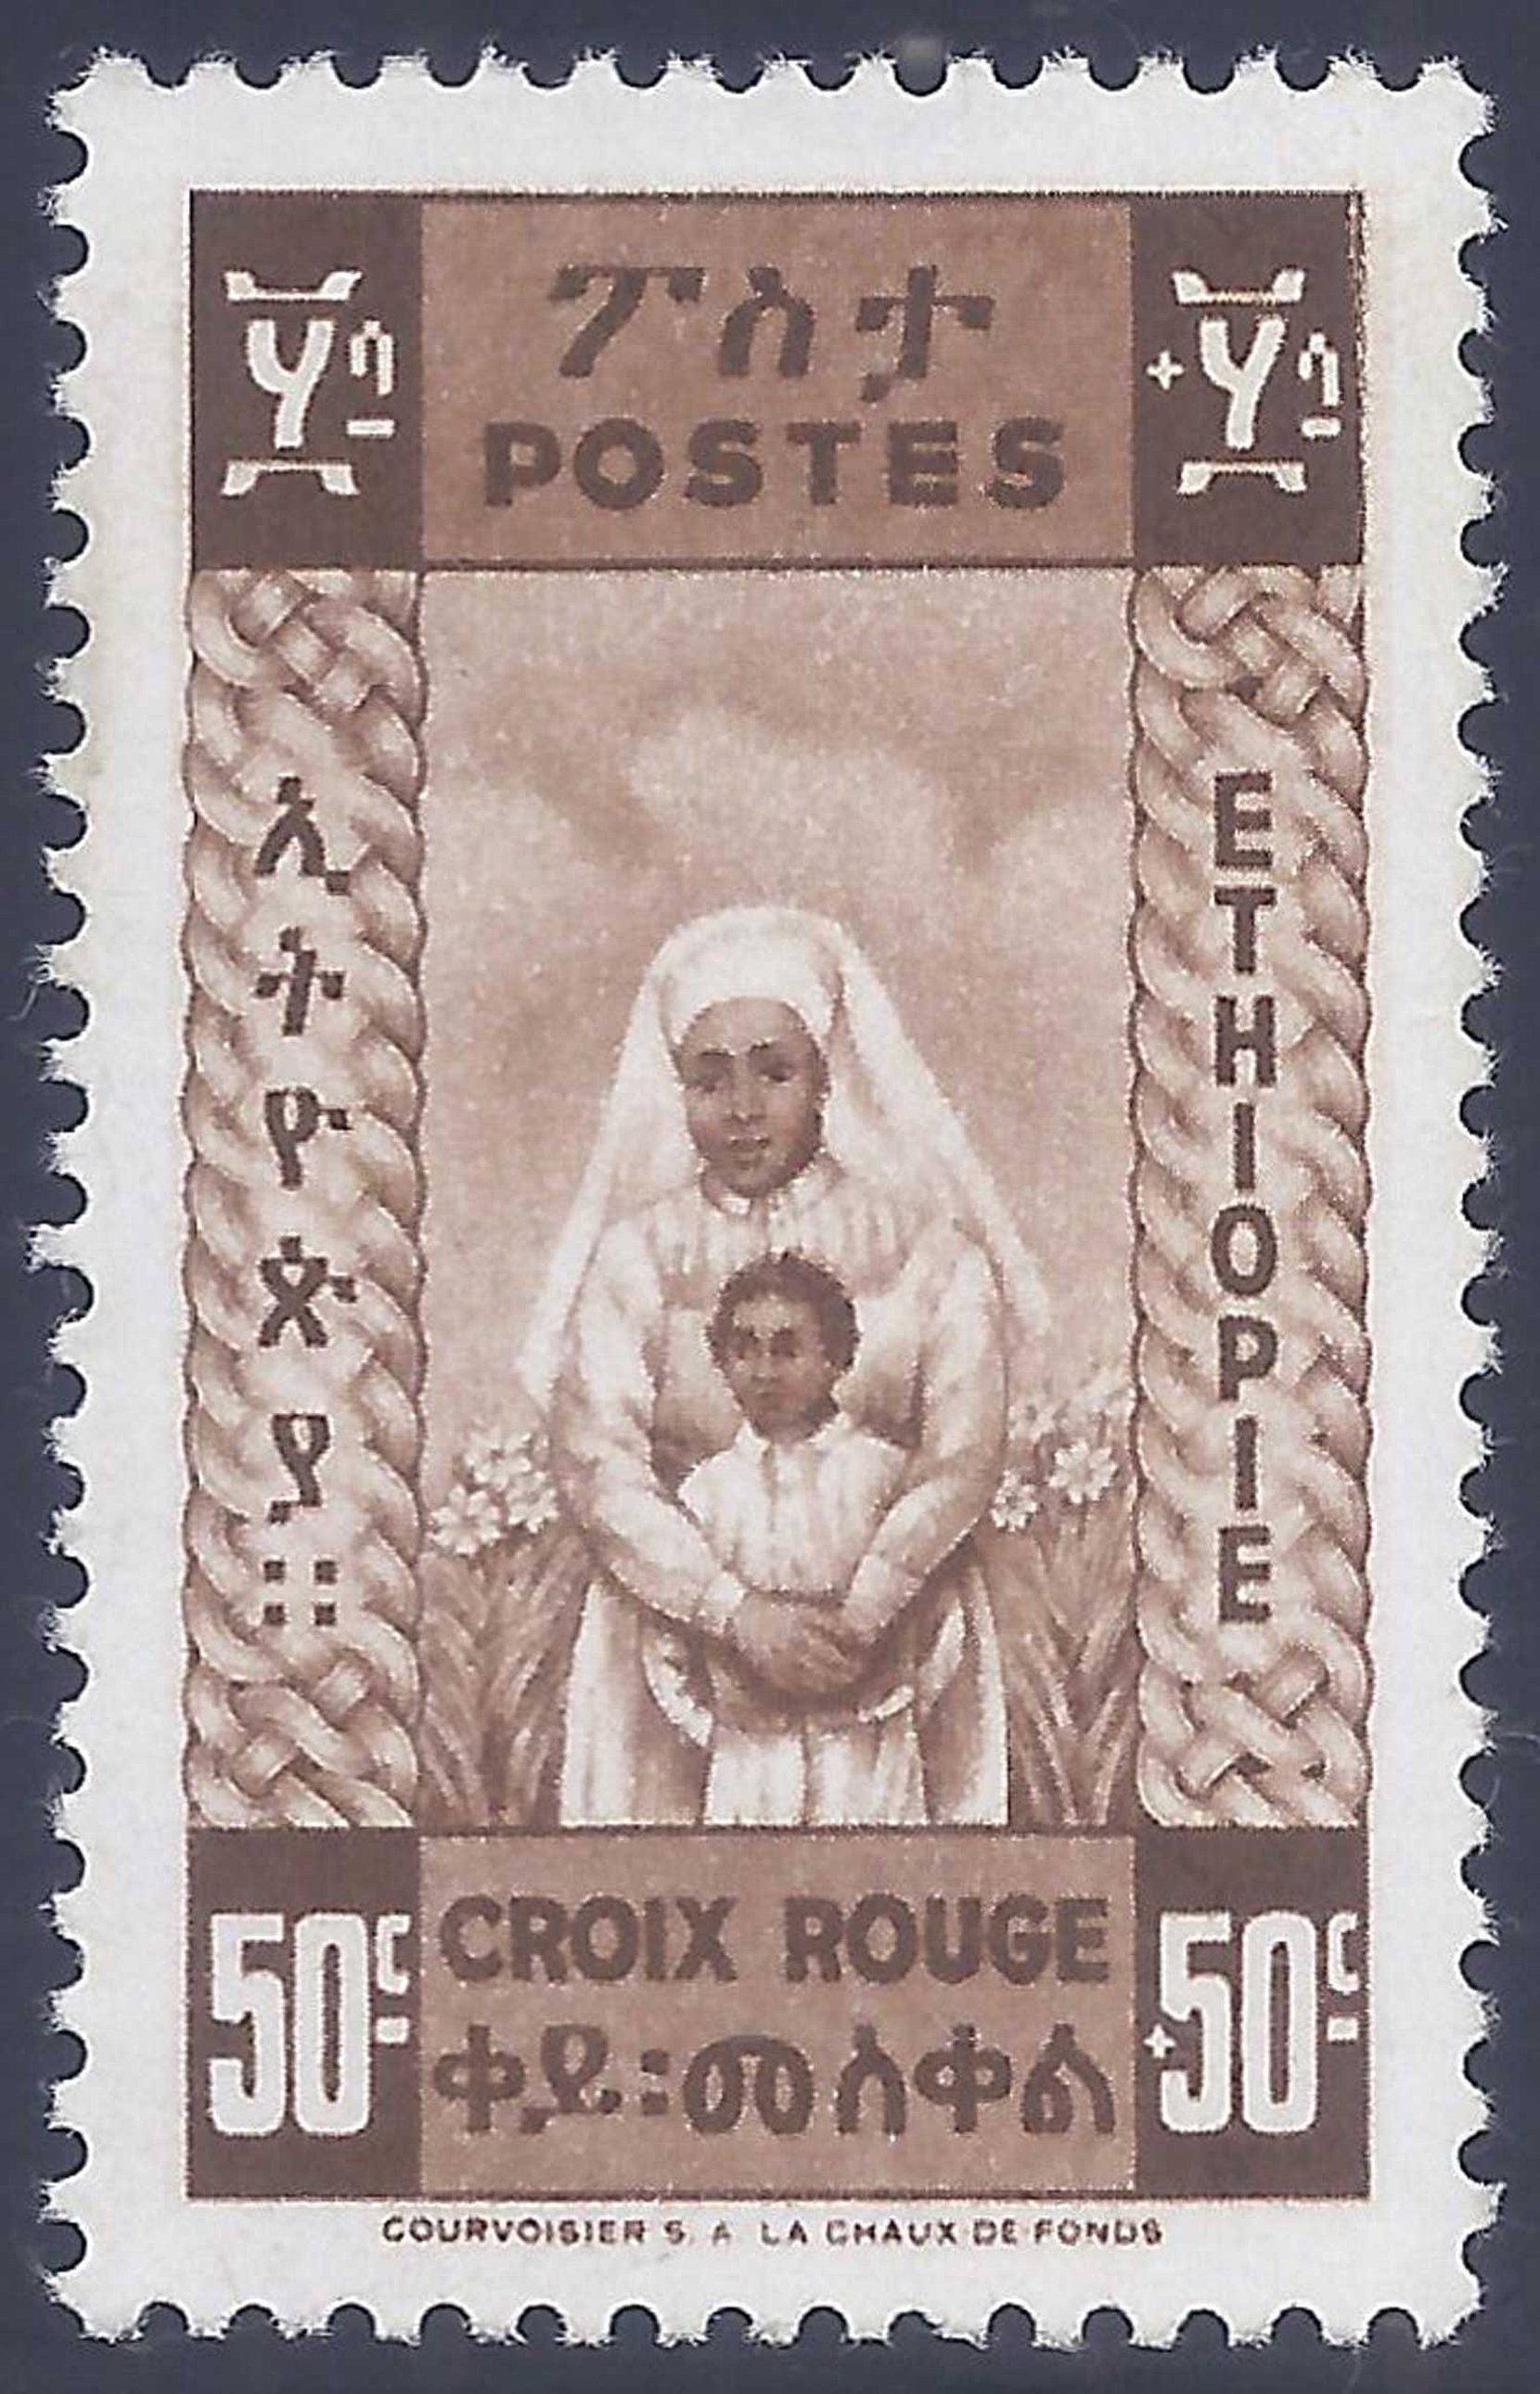 mi#et-iv philately postage stamps